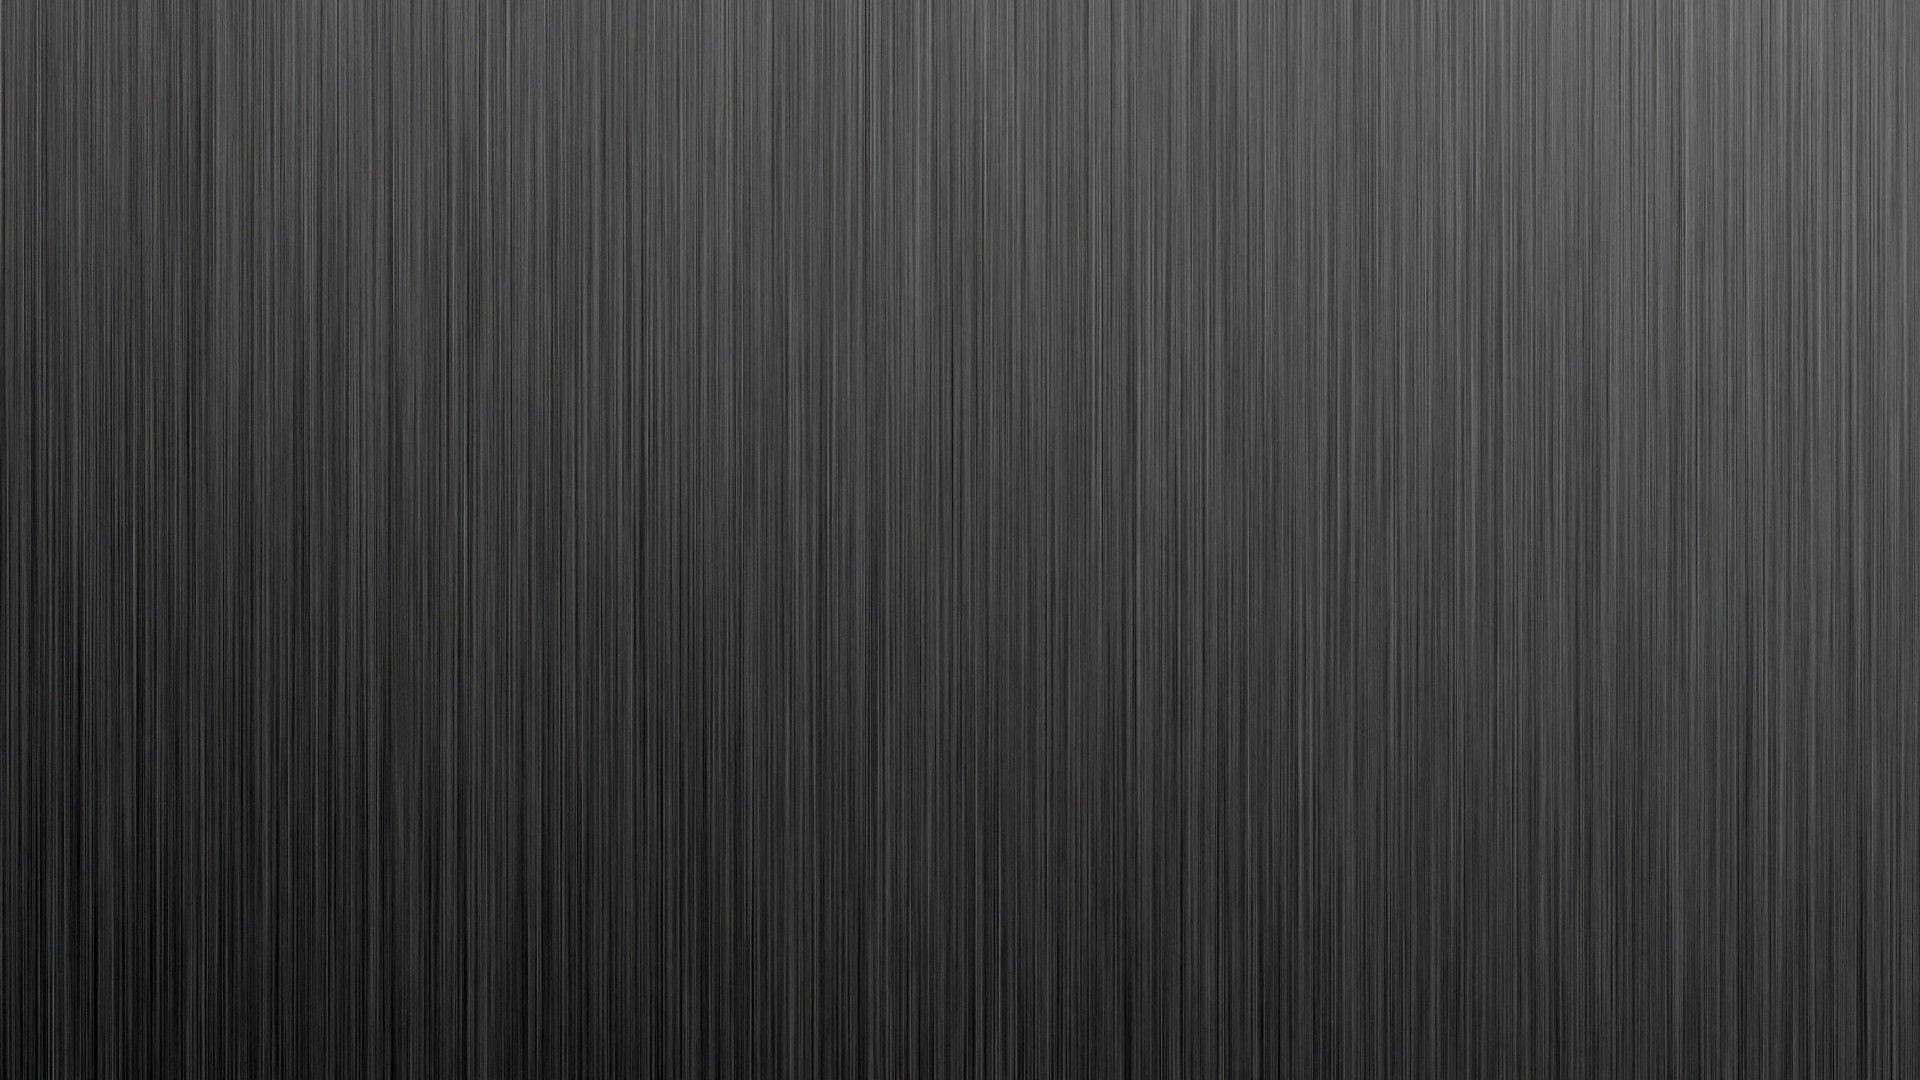 Metallic Wallpaper For Desktop Best Hd Wallpapers Silver Wallpaper Hd Metallic Wallpaper Black And Silver Wallpaper